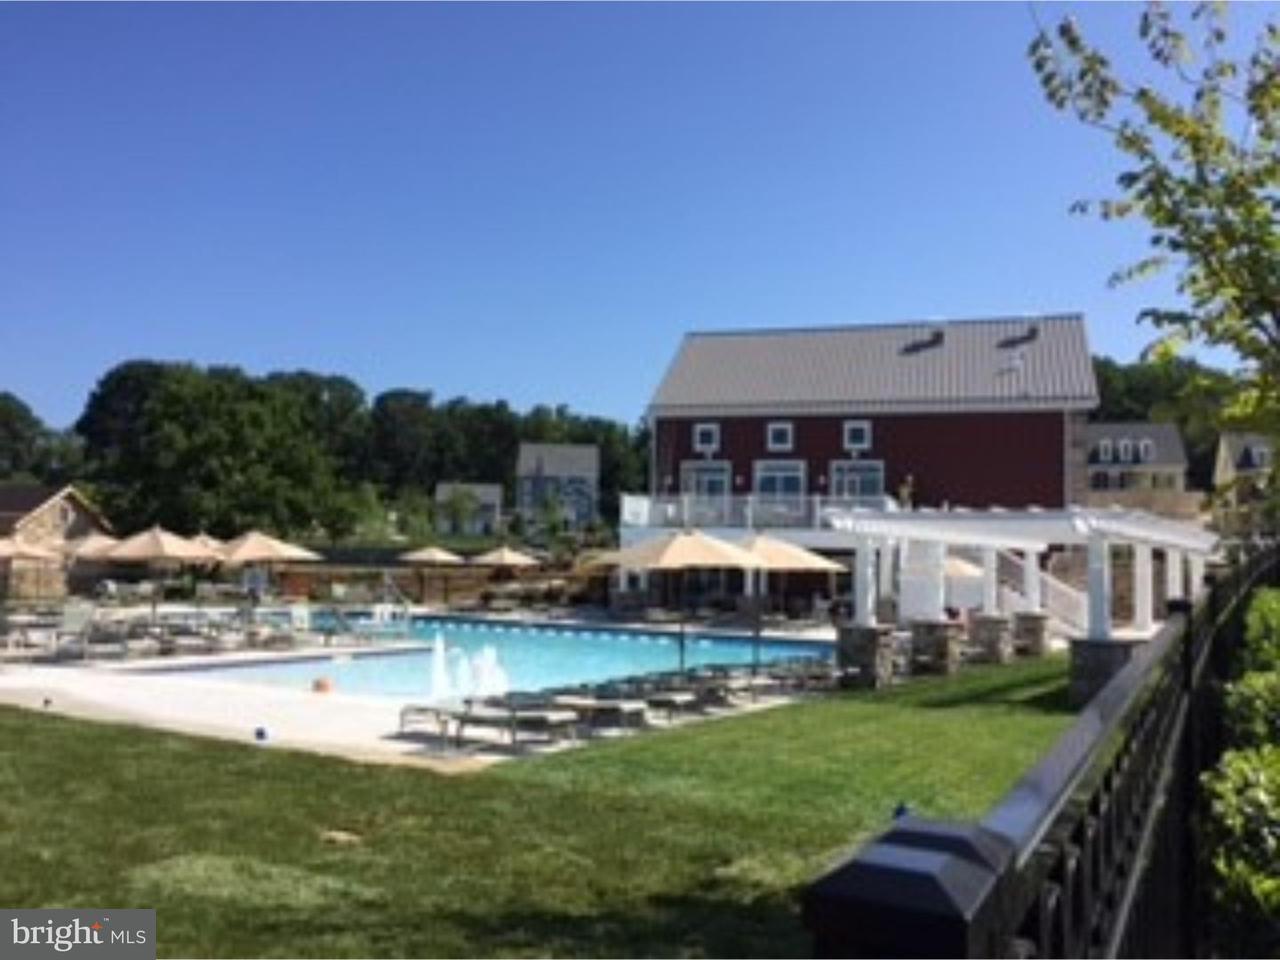 Additional photo for property listing at 133 SPRING OAK DR #00RSD  Malvern, Пенсильвания 19355 Соединенные Штаты